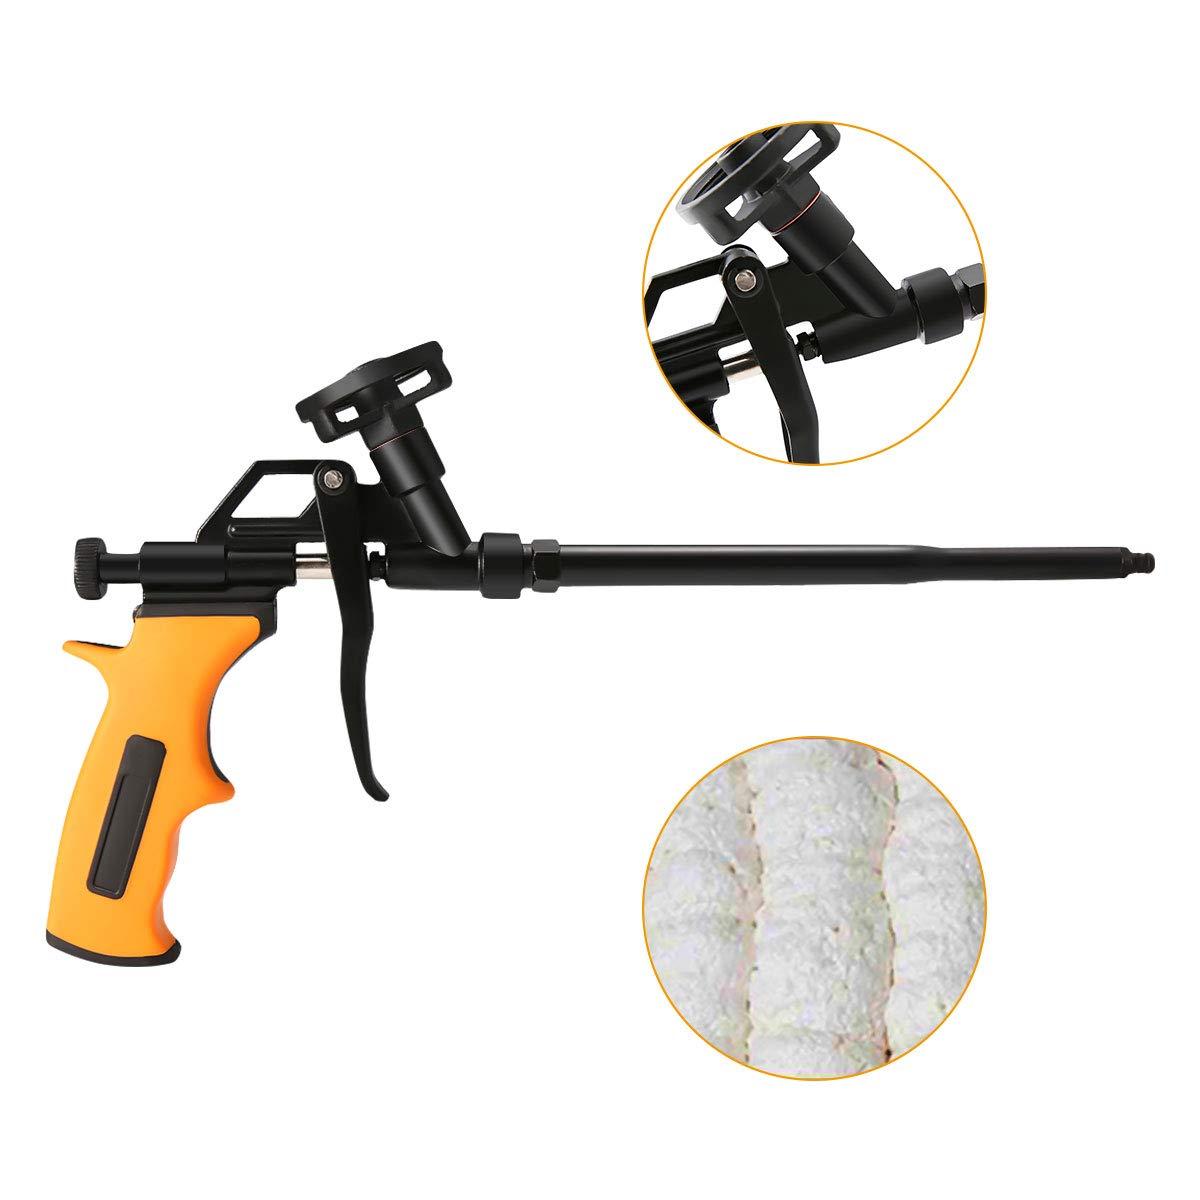 ARTISTORE Foam Gun, Pu Expanding Foaming Gun, Caulking Gun Metal Body Pro Heavy Duty Grade Expanding Spray Application Applicator for Caulking, Filling, Sealing, Home School Office Use